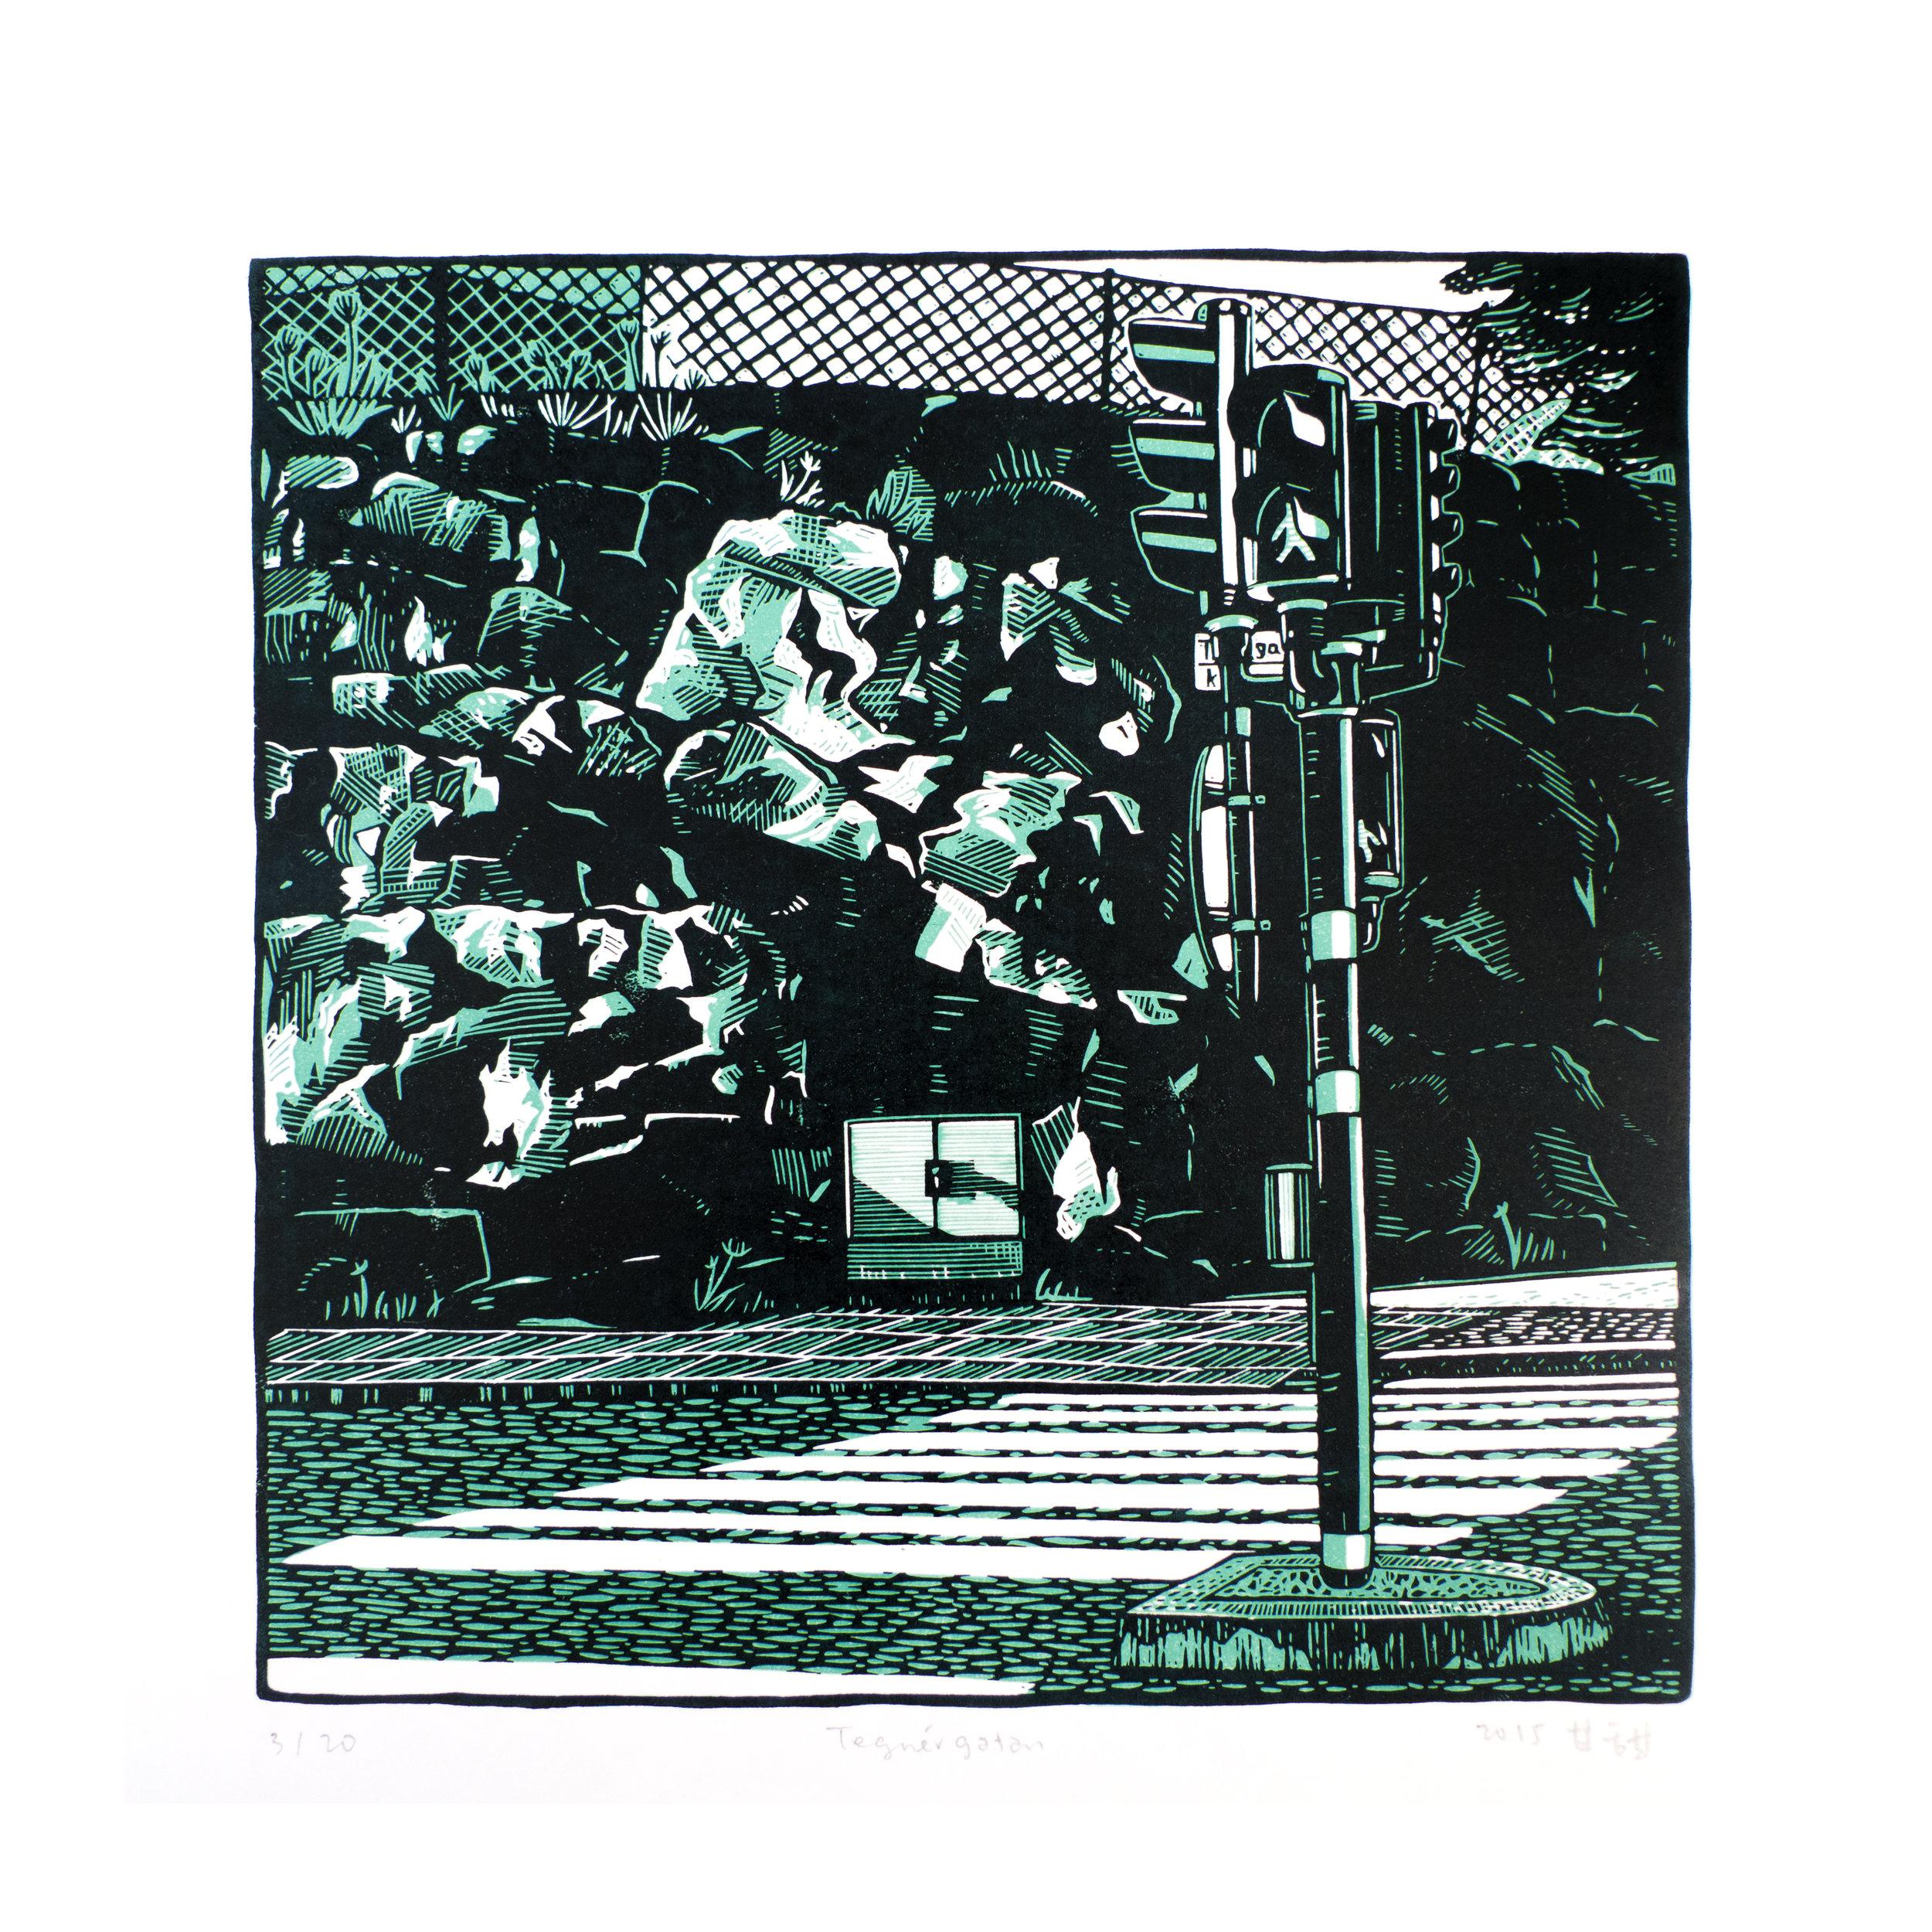 Tegnérgatan , original two-color reduction linocut. 20 x 20 cm, edition of 20. Year 2016.